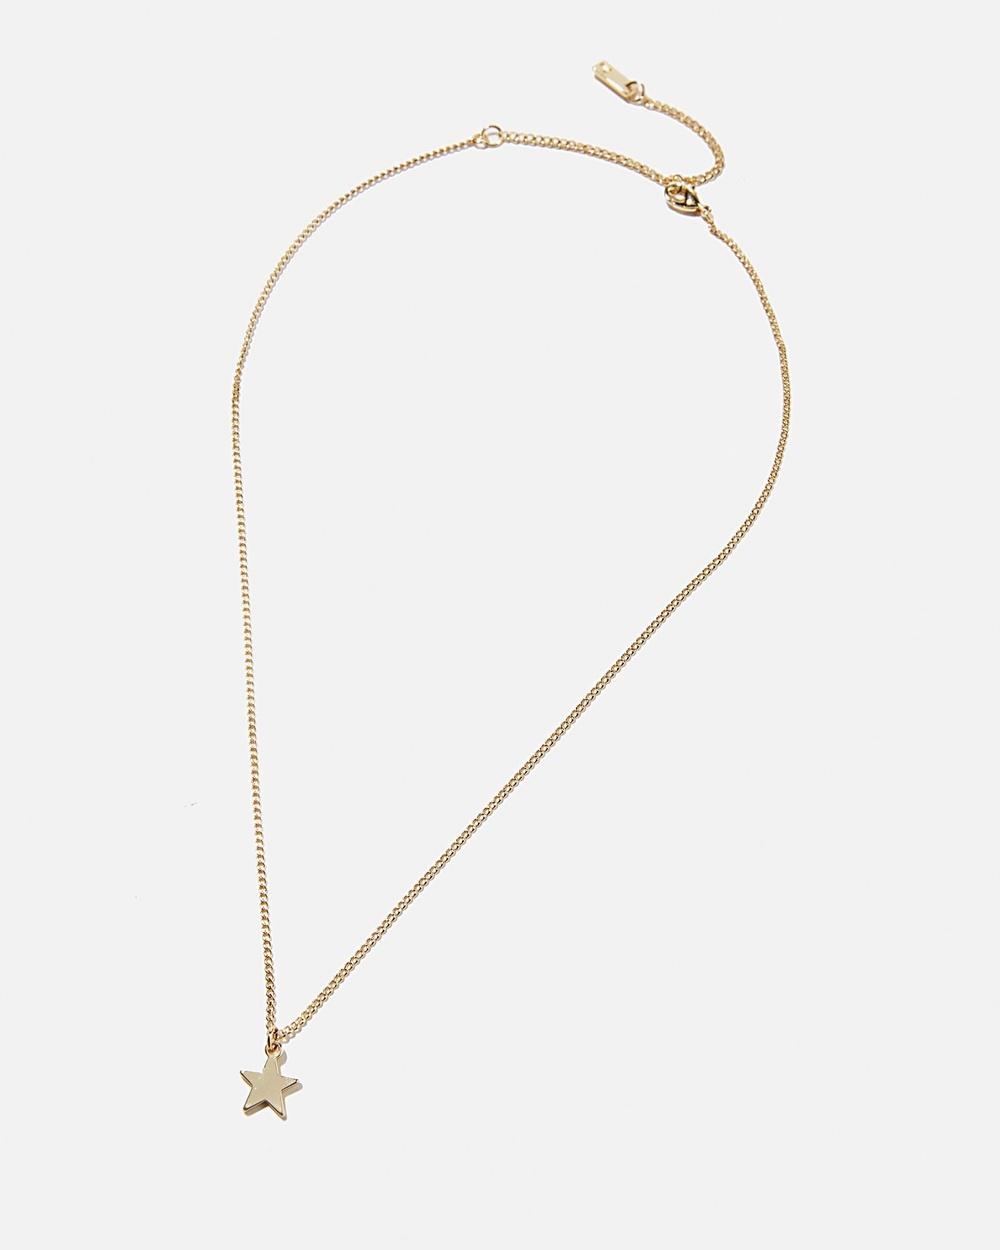 Rubi Premium Pendant Necklace Jewellery Gold Plated Star